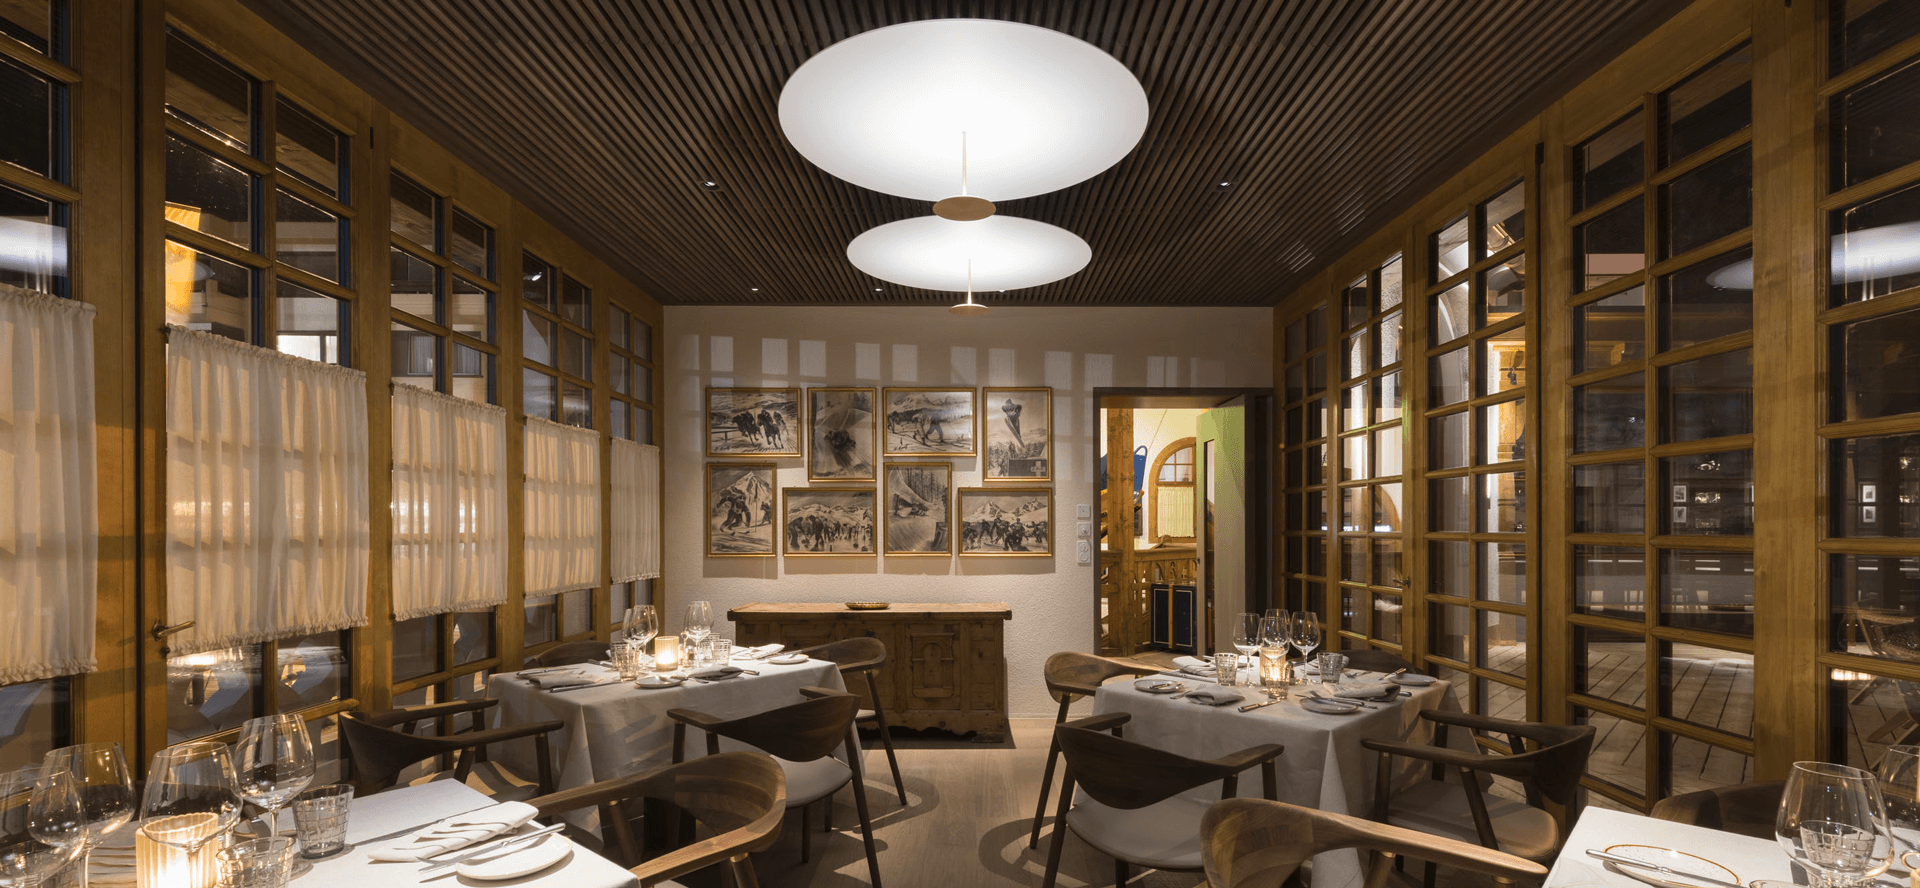 Kulm Eispavillon Restaurant St. Moritz, Switzerland